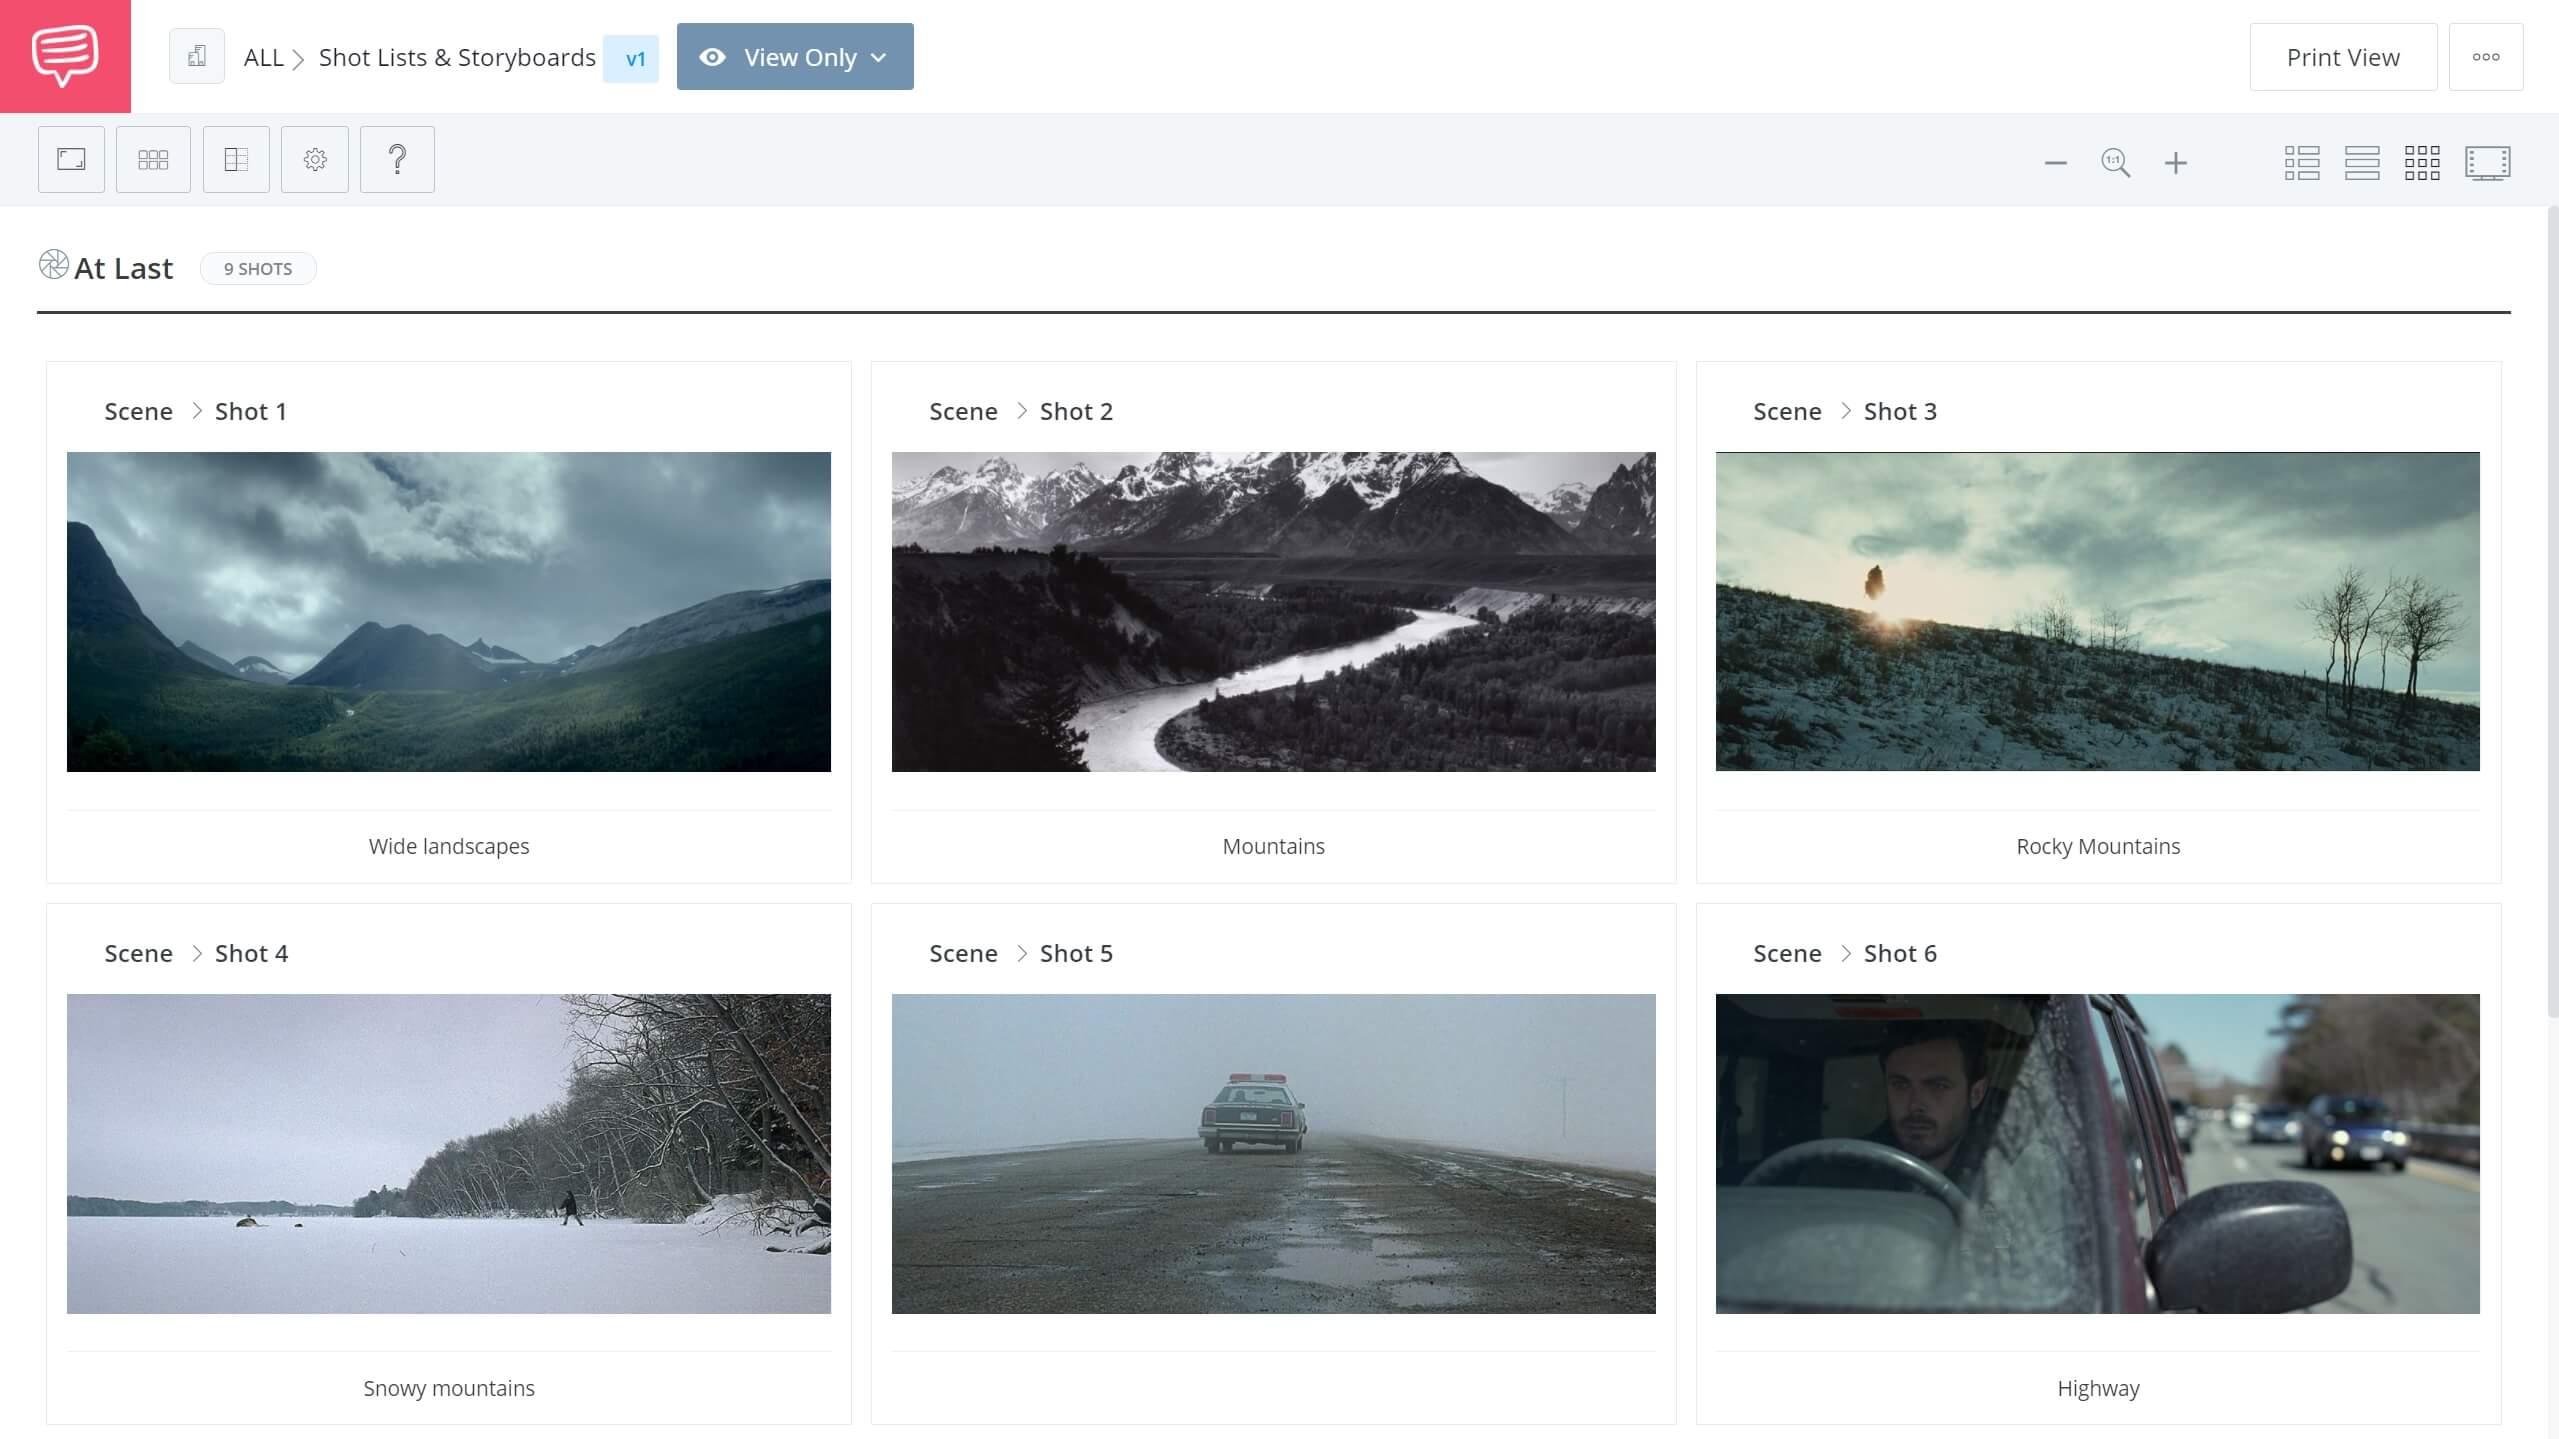 What is Film Lookbook Example - Film Lookbook Example - StudioBinder Shot Listing Software